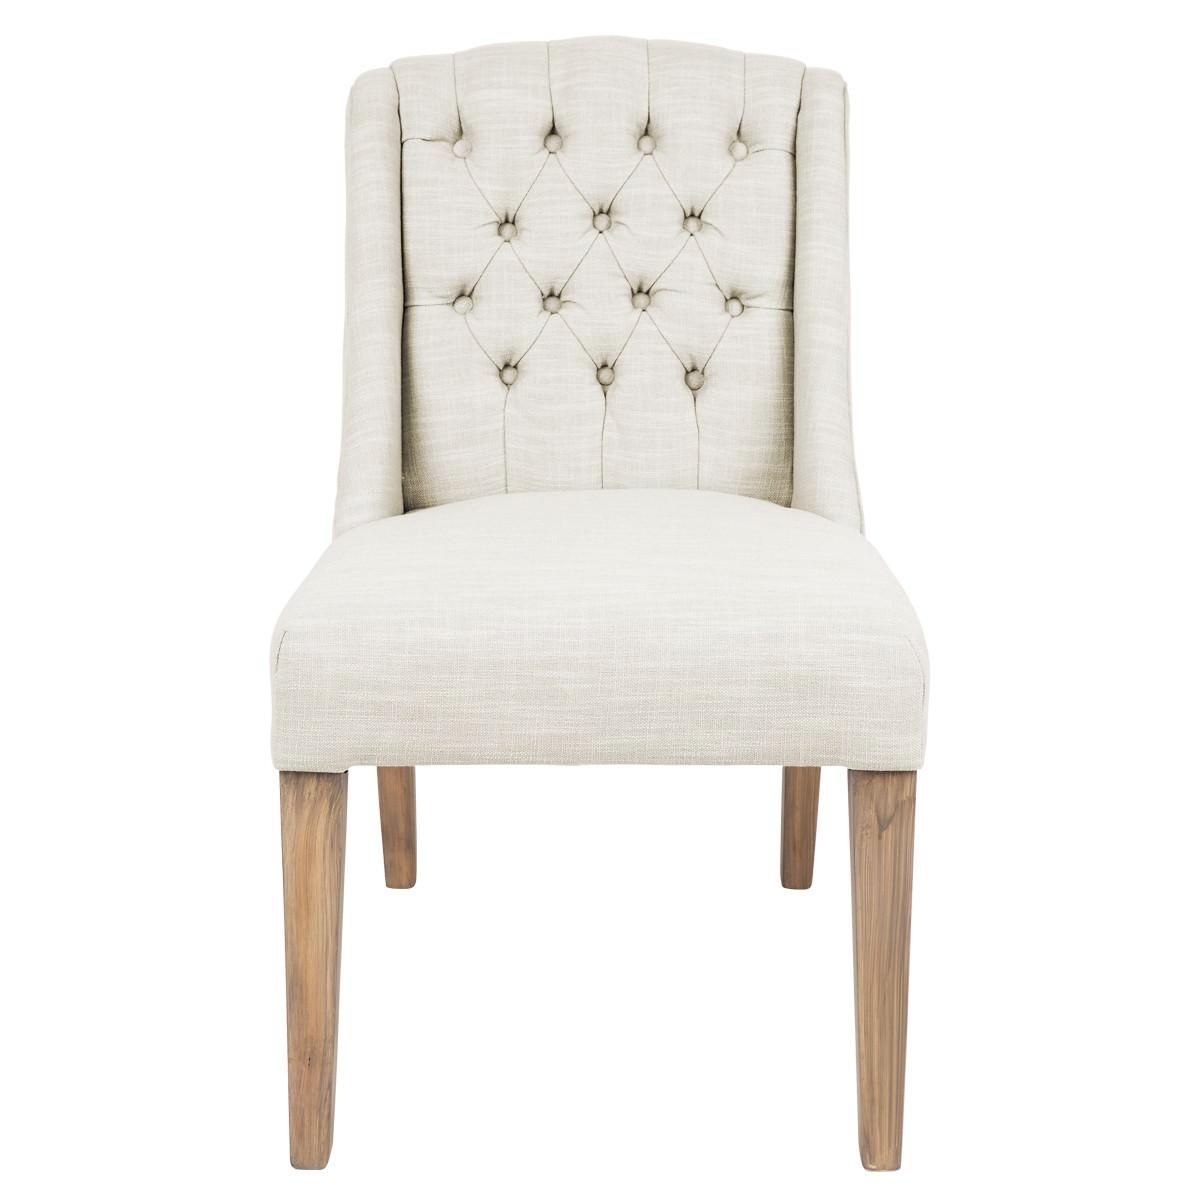 Montauk Fabric Dining Chair, Light Beige